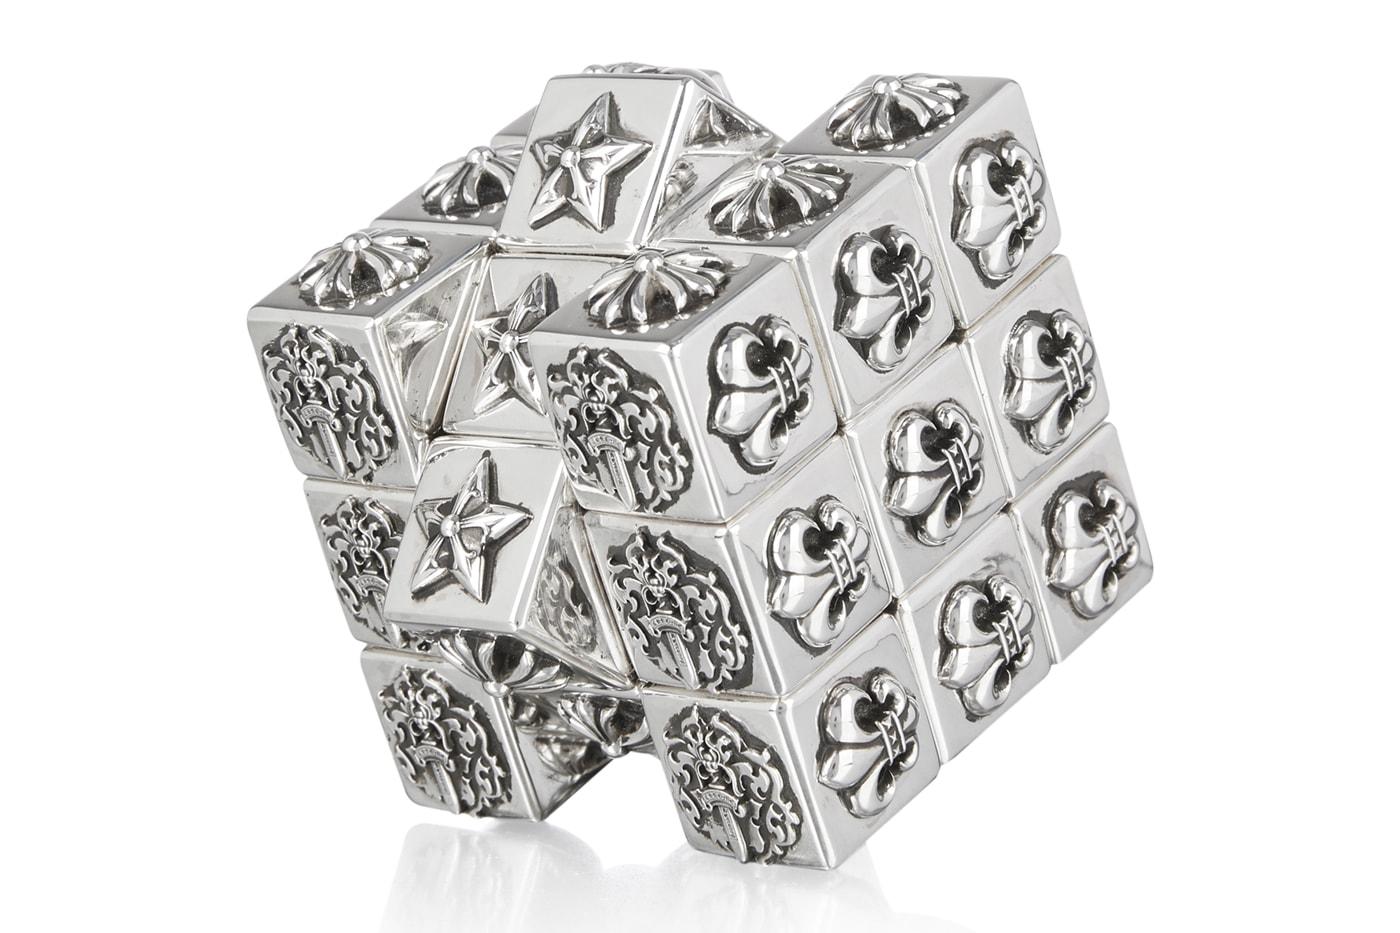 prada Black + Blum Chrome Hearts Rubik's Cube bodega new balance 990 990v3 VANS DANNY BRADY PALACE SKATEBOARDS VANS AUTHENTIC RORY MILANES JONAH AND STAN VANS SKATE AUTHENTIC supreme BUTTHOLE SURFERS JEAN-MICHEL BASQUIAT DR. MARTENS DR. MARTENS 1461 DR. MARTENS 1460